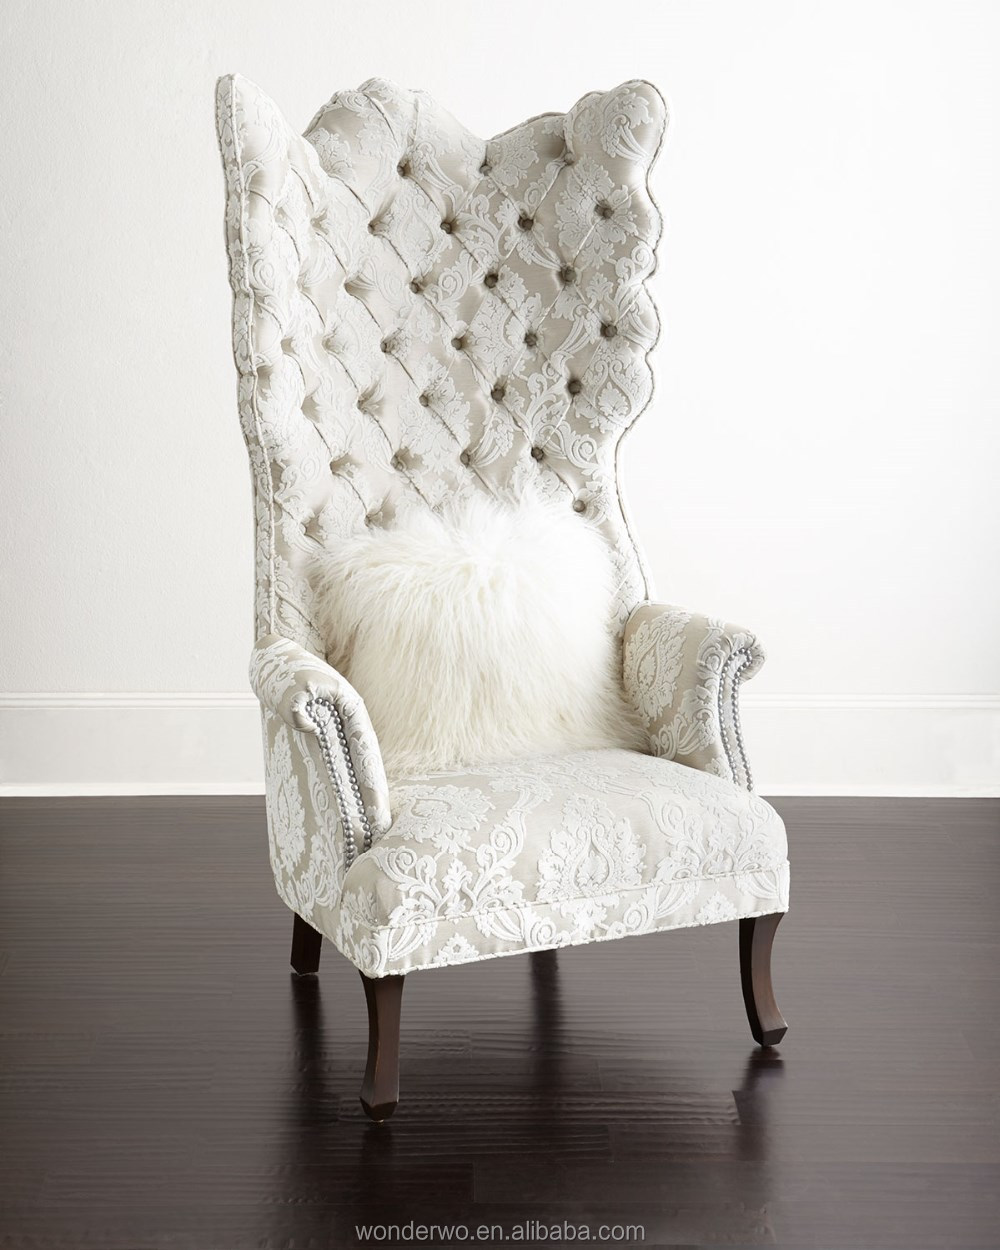 Tufted Wing Chair high back chair Silver-tone nailhead trim curved ...